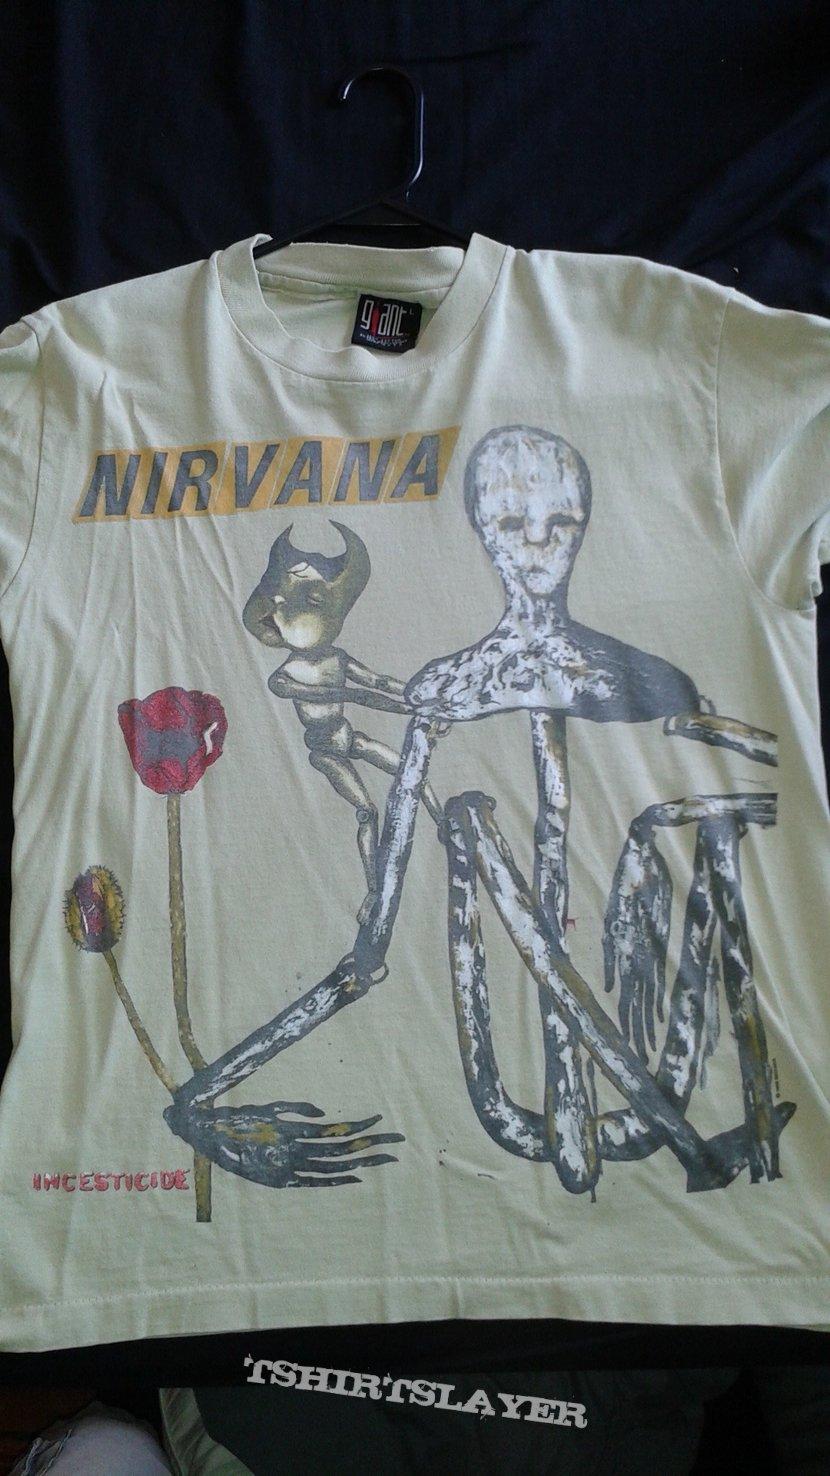 Nirvana Incesticide T-shirt